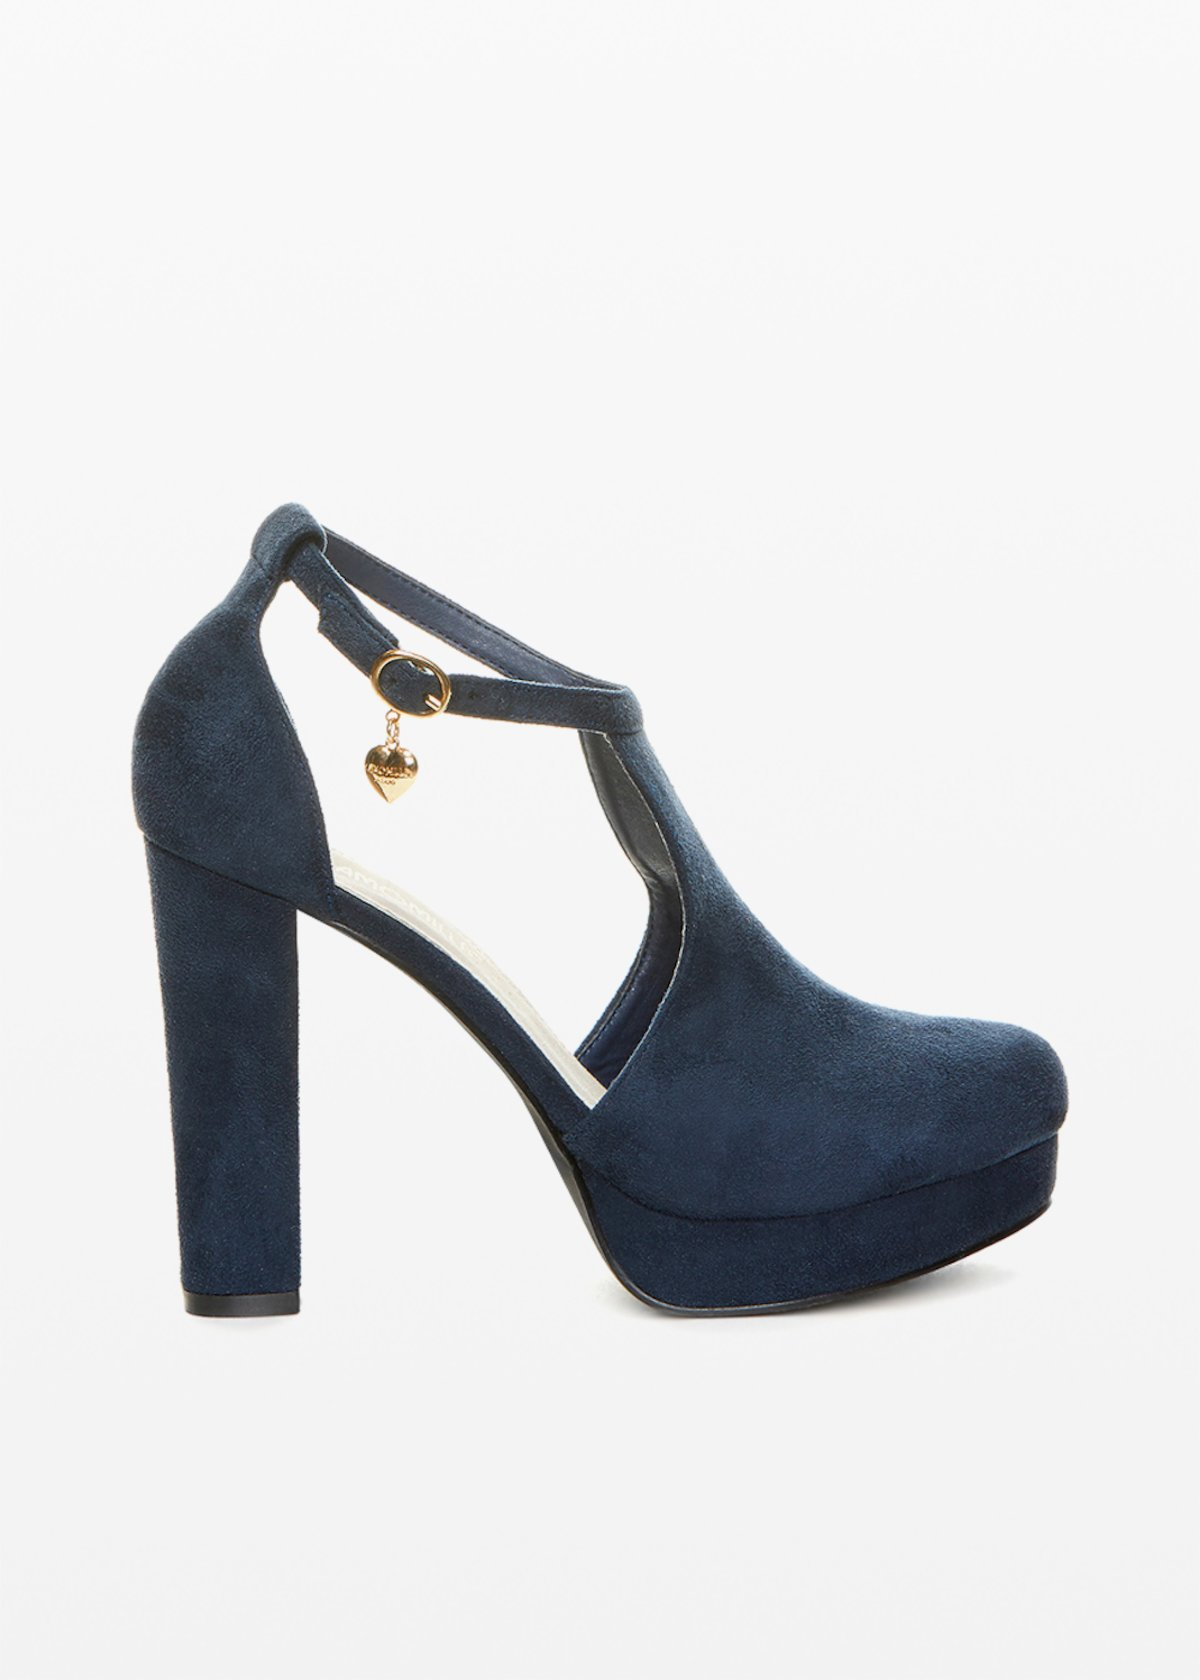 Sandalo Steila in ecosuede con plateaux - Medium Blue - Donna - Immagine categoria